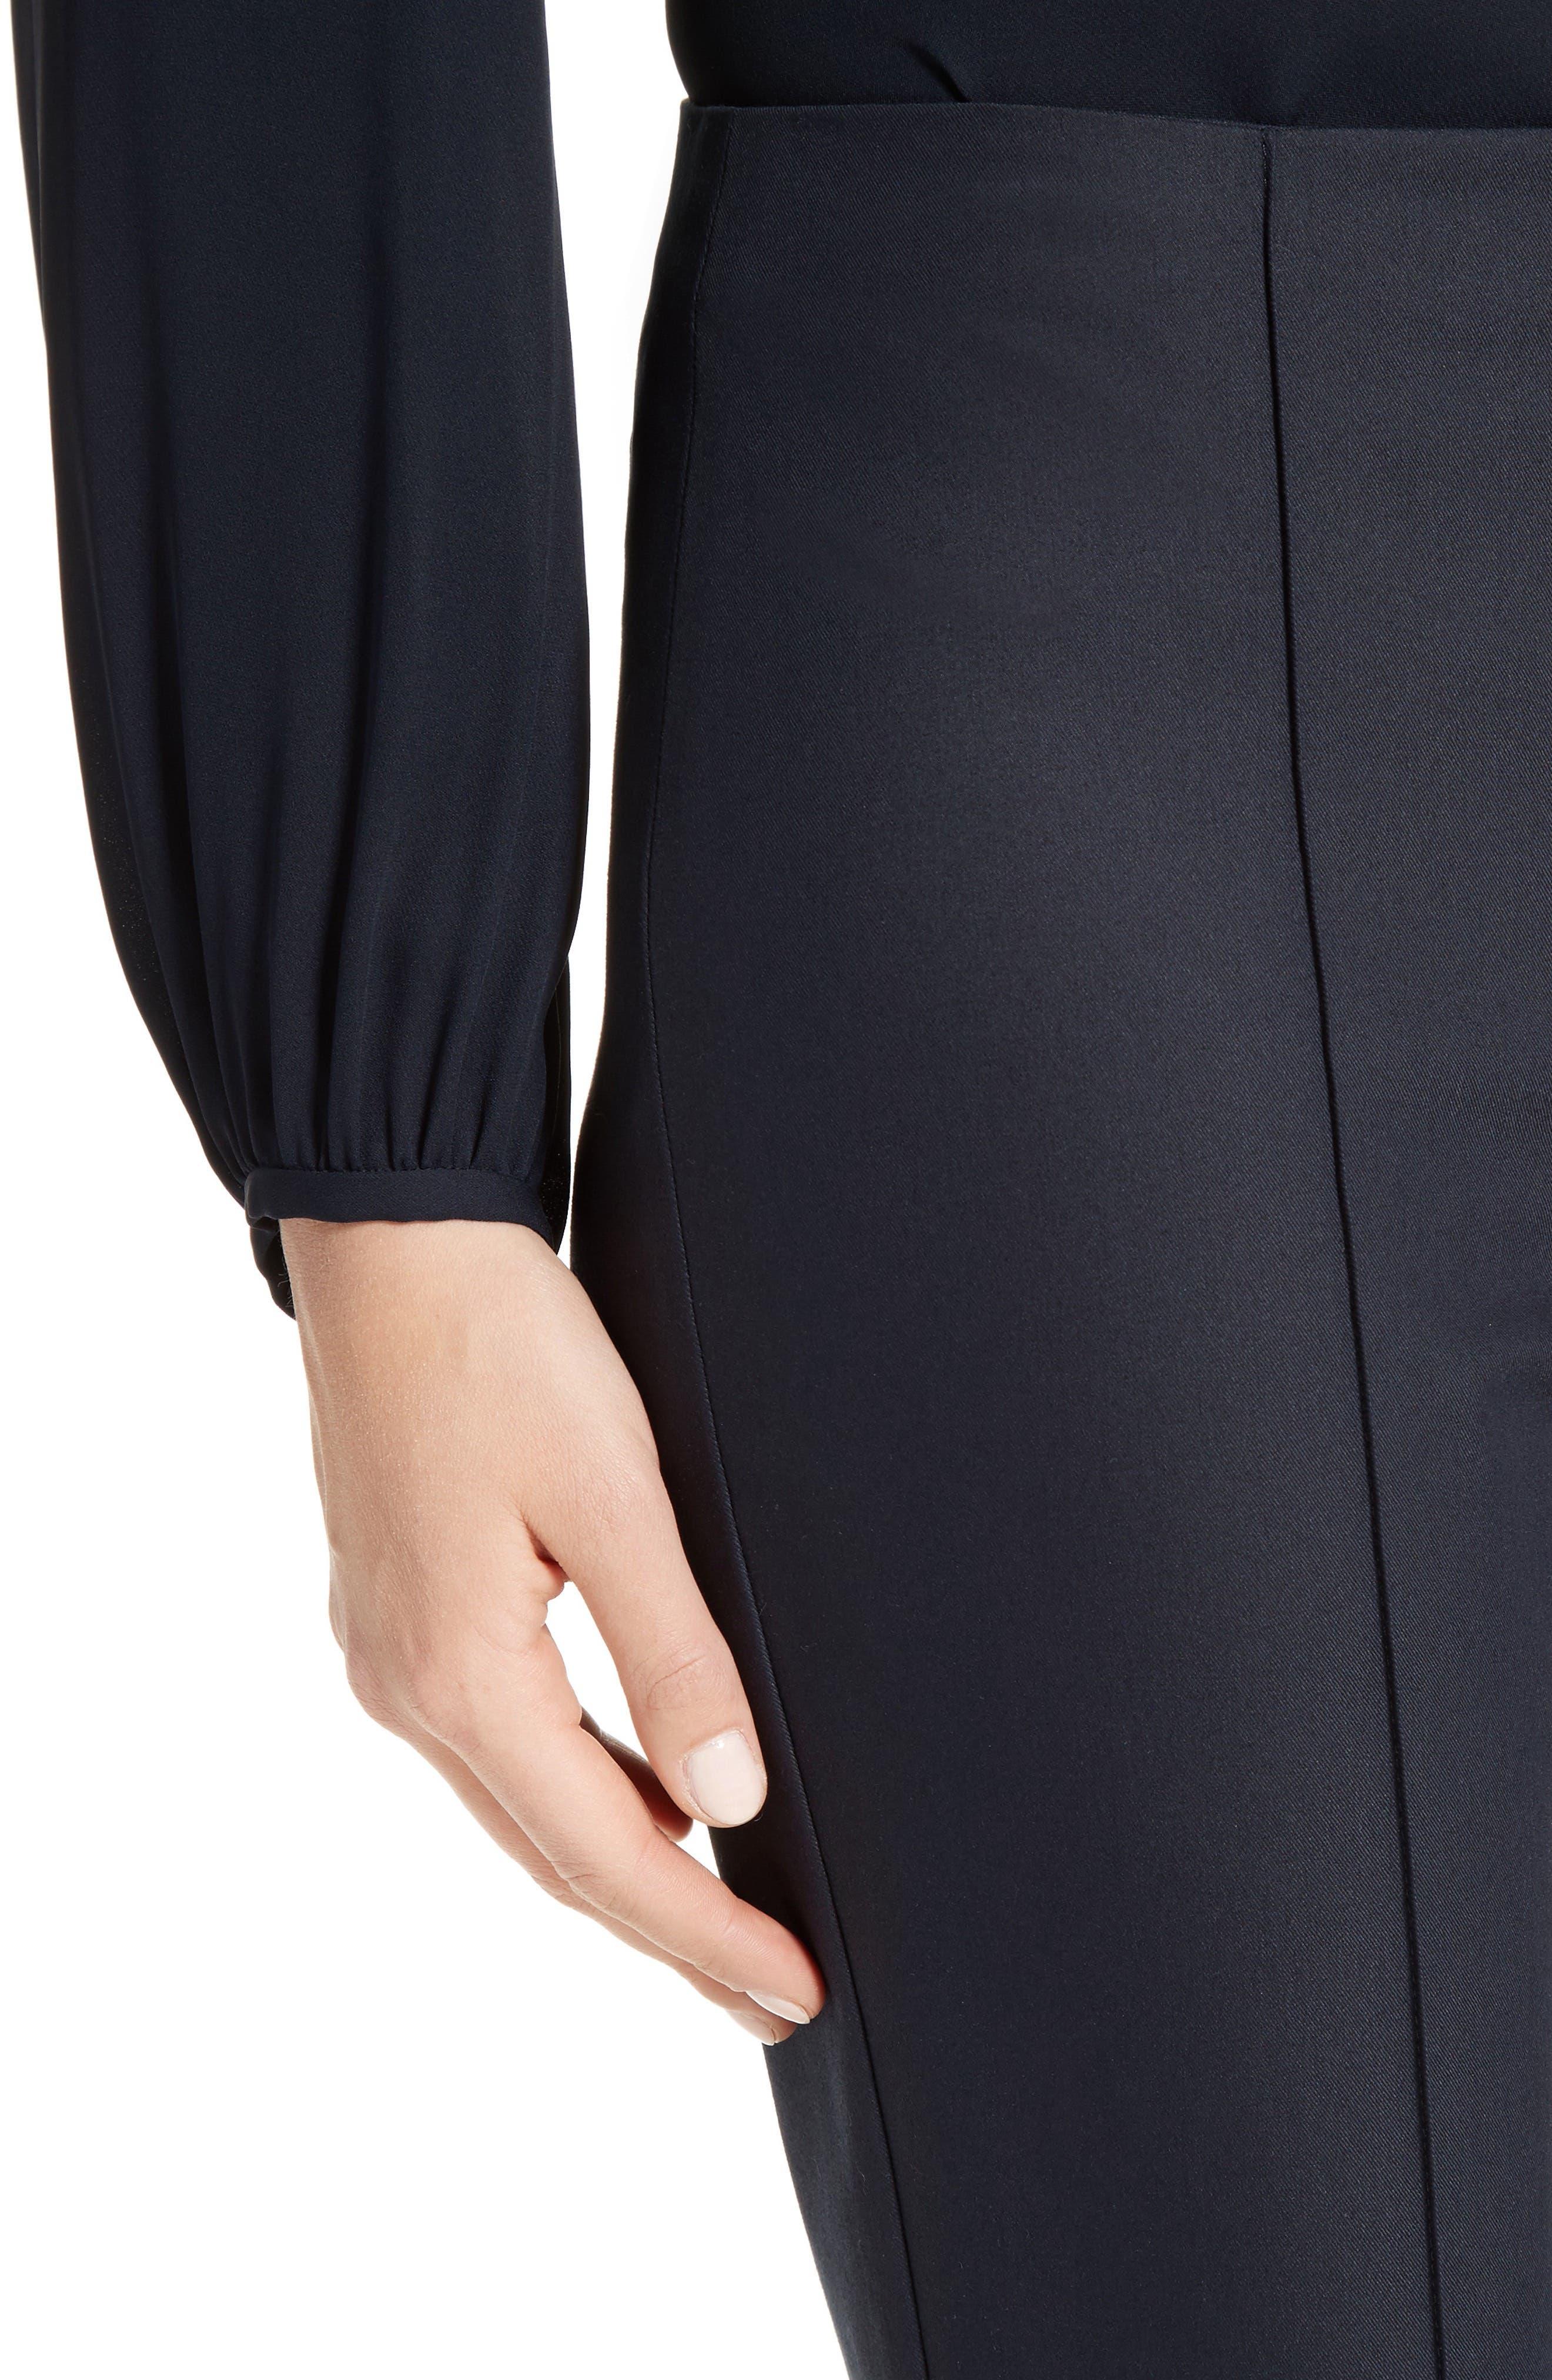 Alettah Stretch Skinny Pants,                             Alternate thumbnail 4, color,                             001